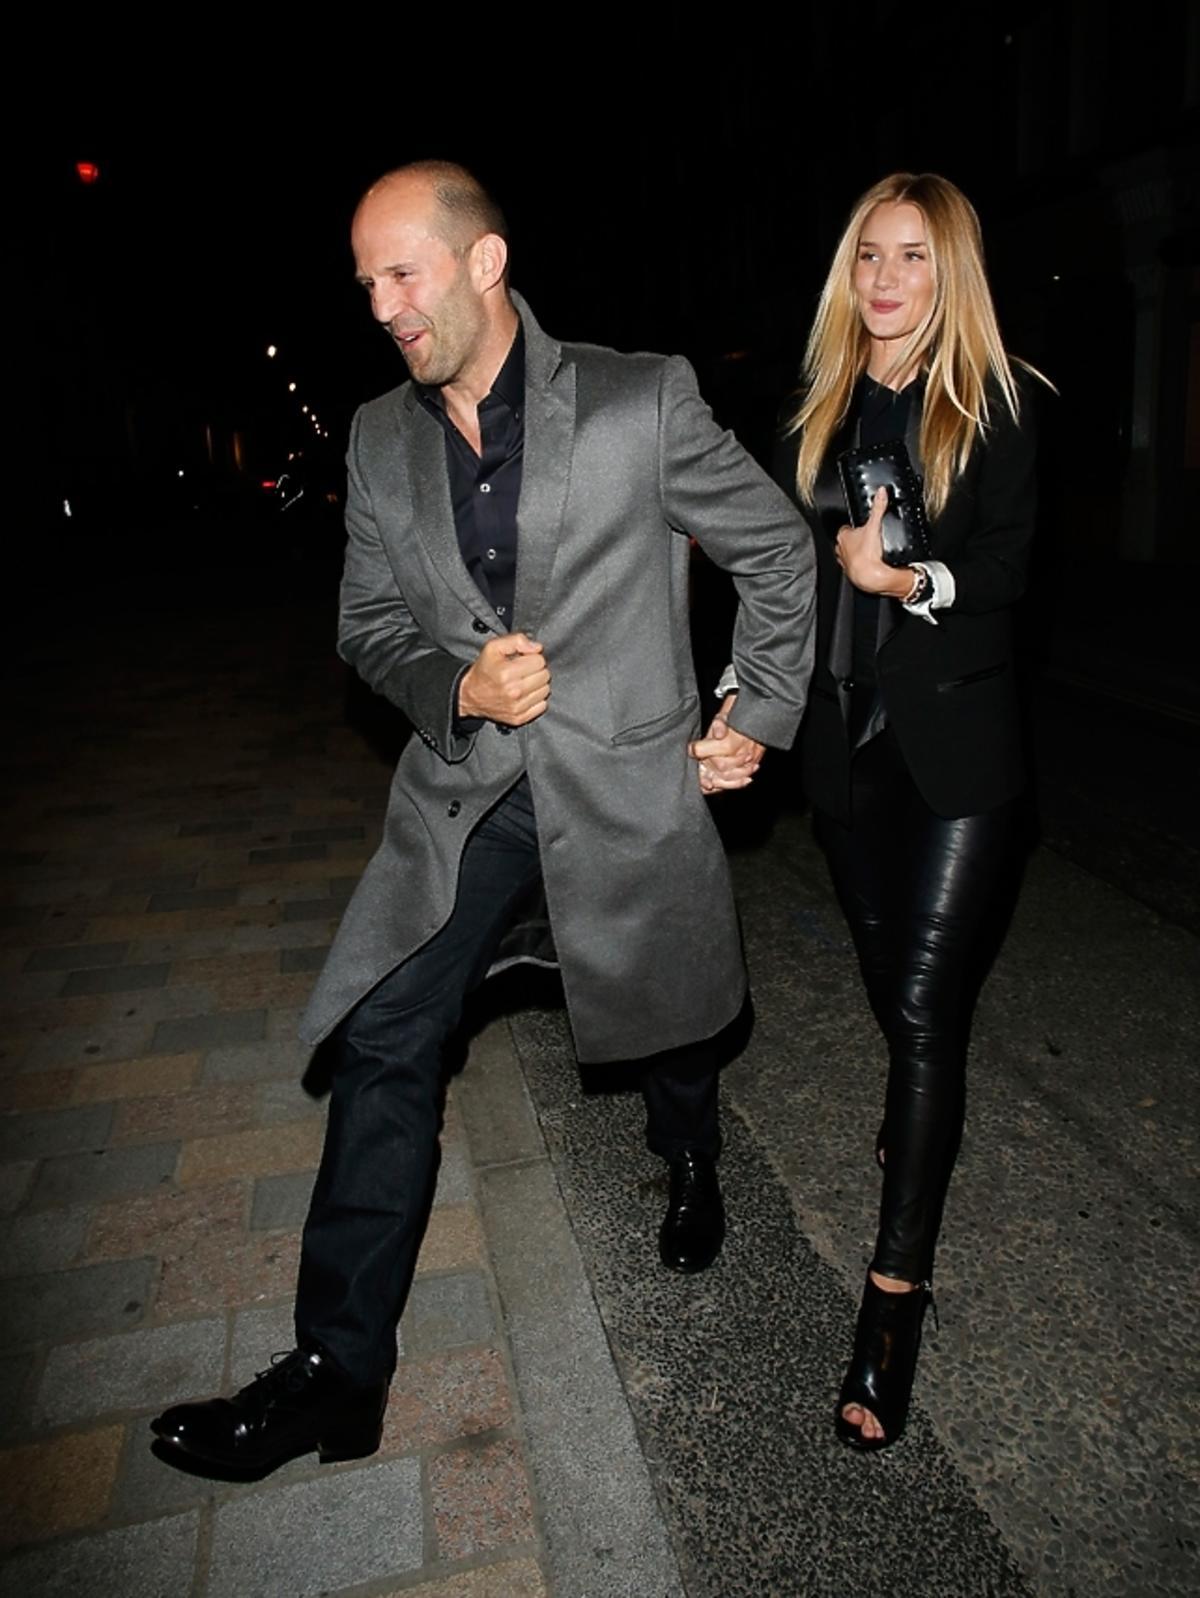 Jason Statham i Rosie Huntington-Whitley w Londynie